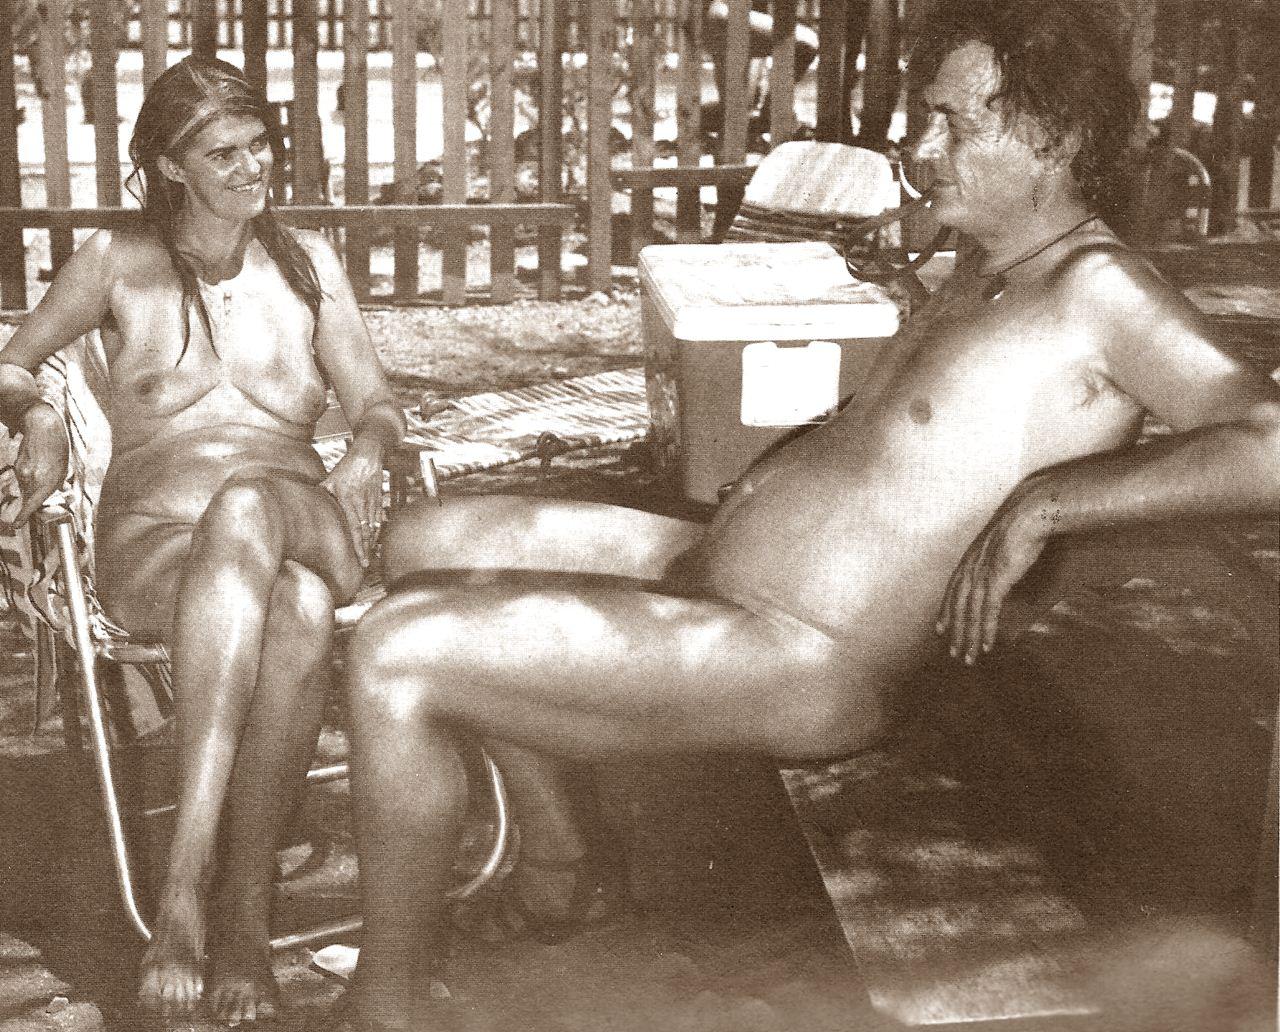 https://www.nudismlife.com/galleries/nudists_and_nude/the_most_natural_nudists/the_most_natural_nudists_0083.jpg